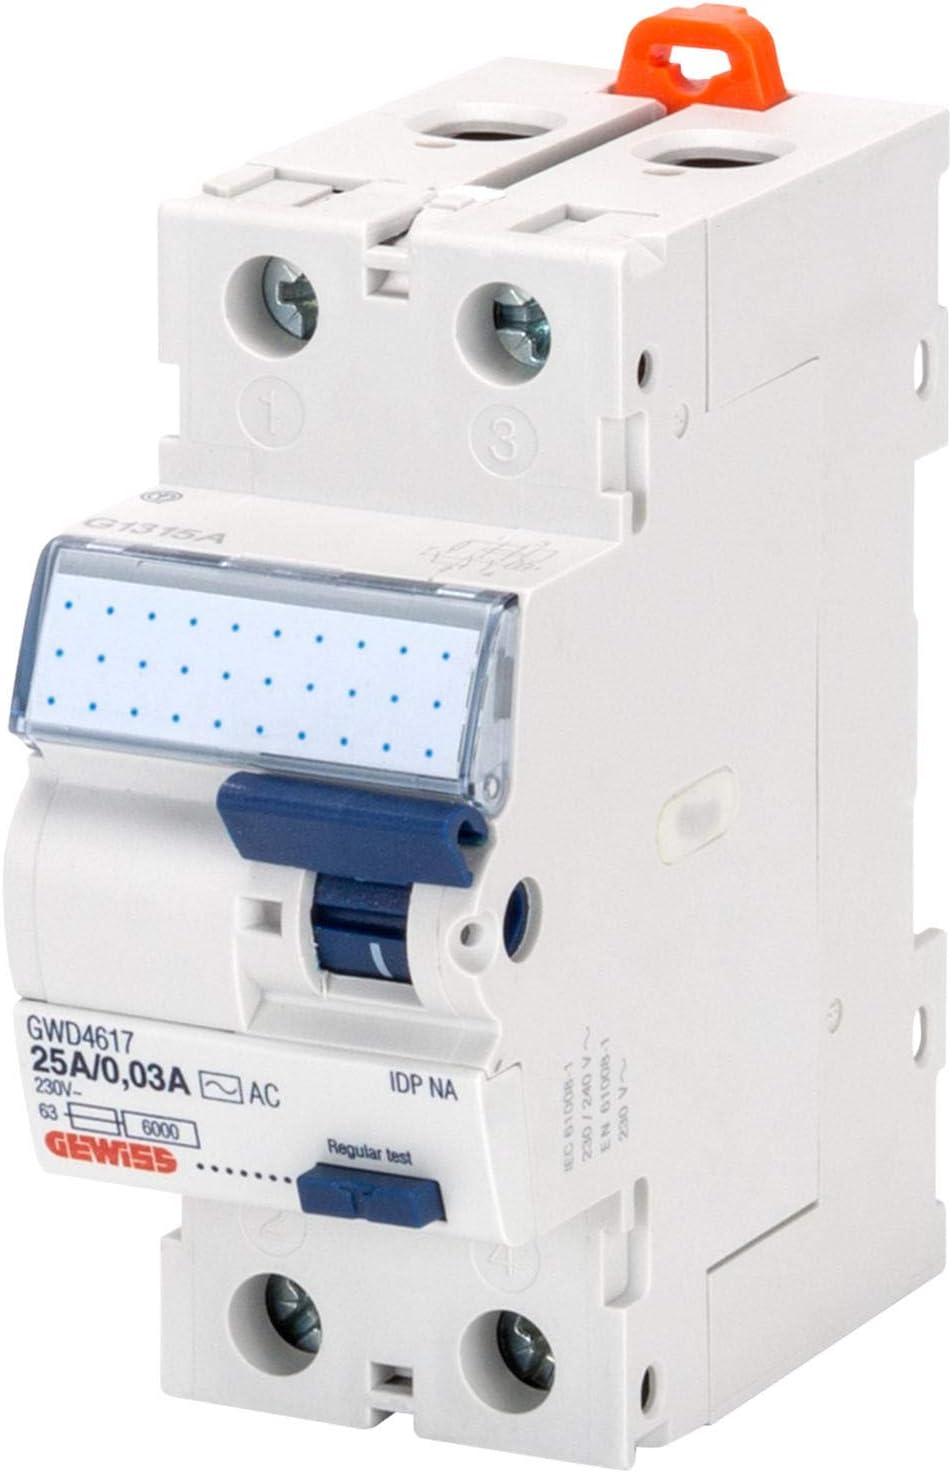 Idp Na 2P 25A Tipo AC Istantaneo Idn=0,03A 230V Gewiss Interruttore Differenziale Puro 2 Moduli